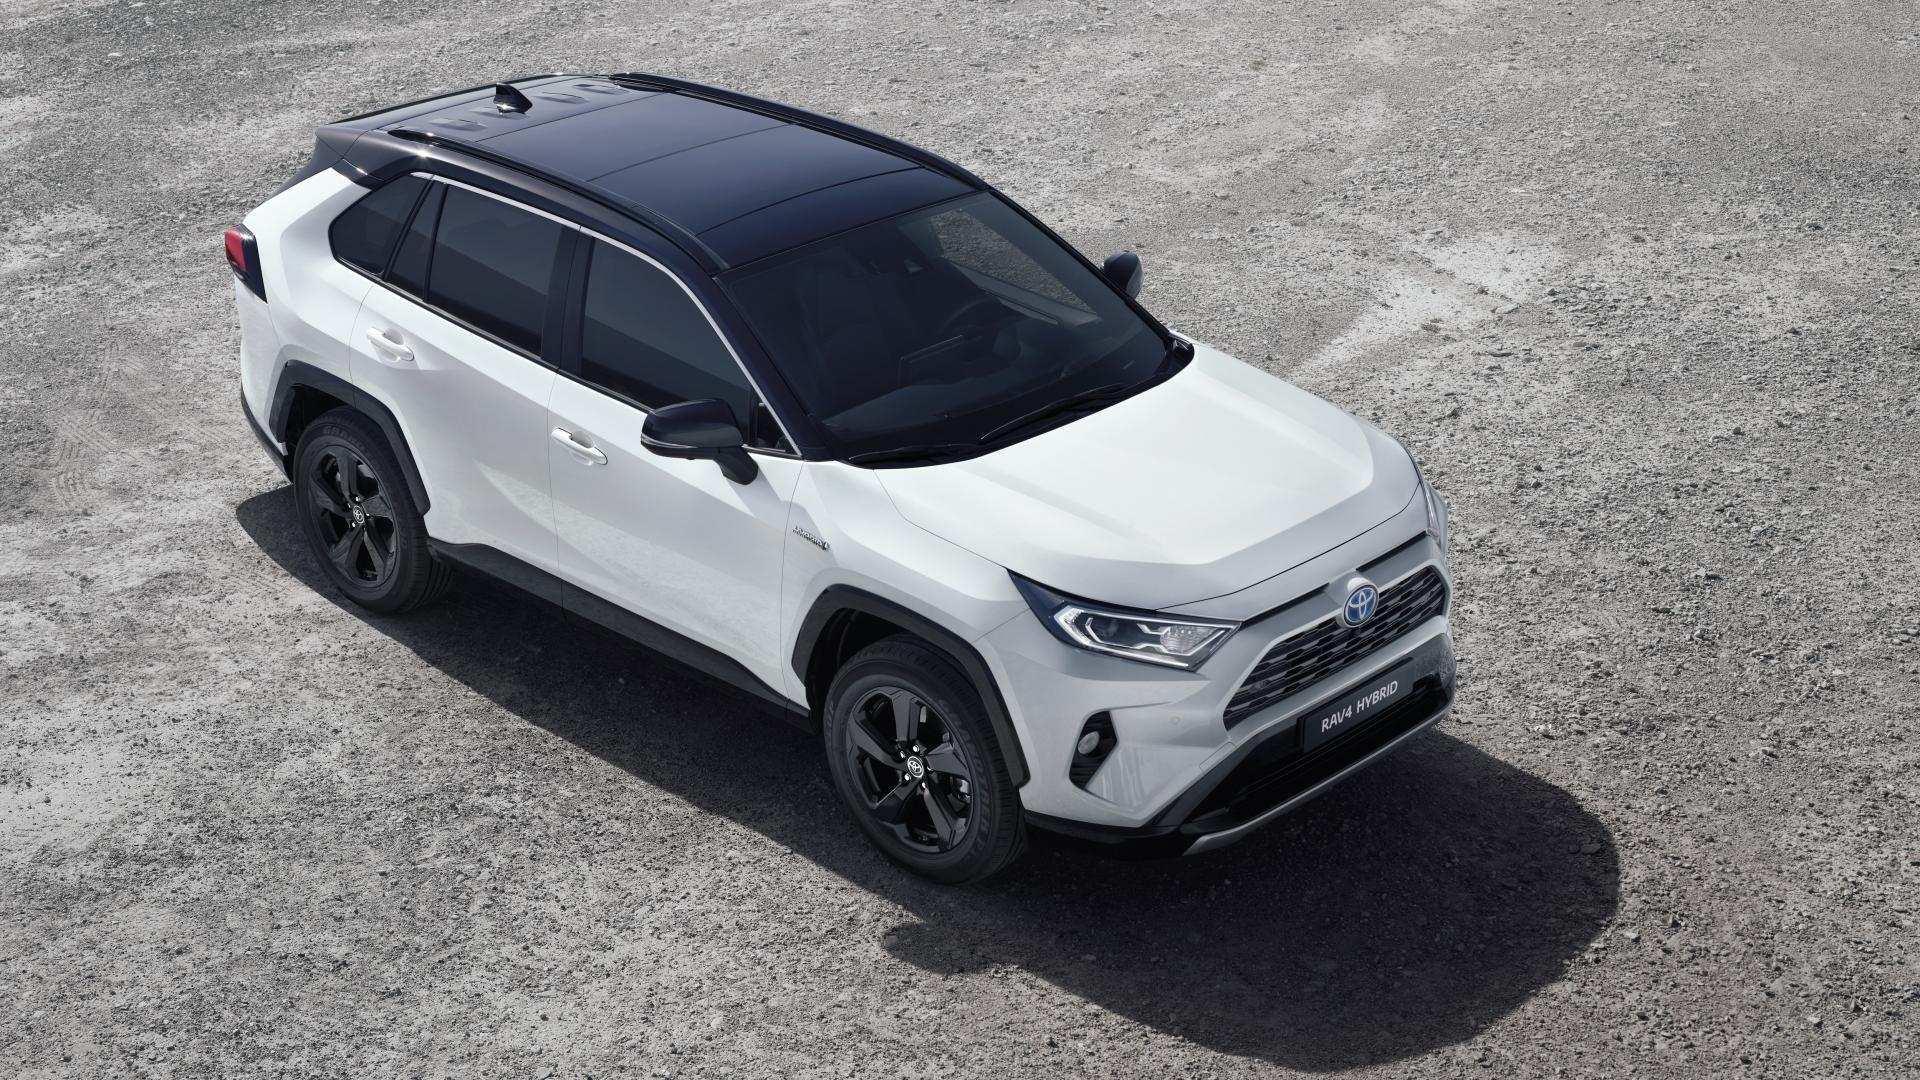 46 All New Toyota Rav4 Hybrid 2020 Spesification for Toyota Rav4 Hybrid 2020